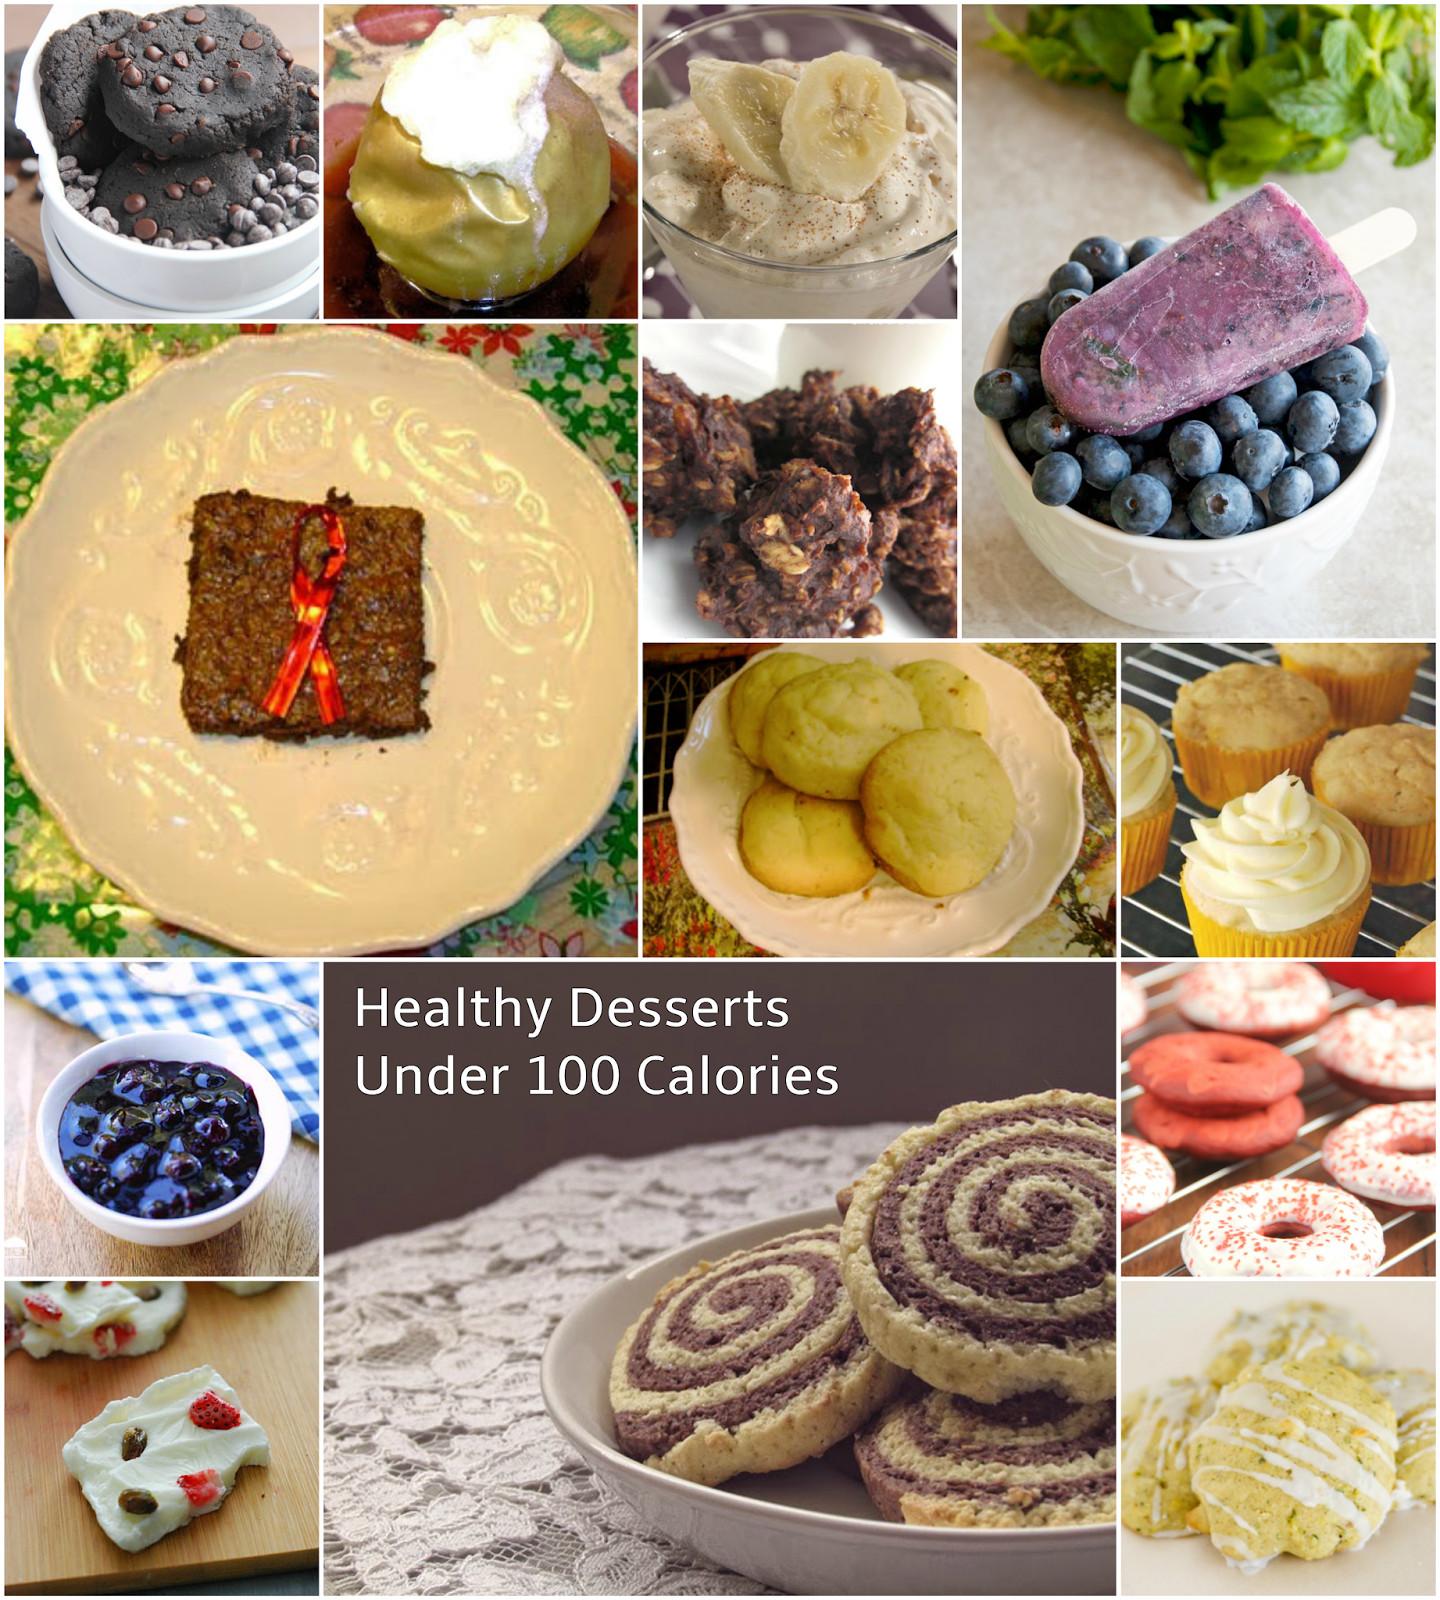 Healthy Chocolate Desserts Under 100 Calories  Becky Cooks Lightly 25 Healthy Desserts Under 100 Calories